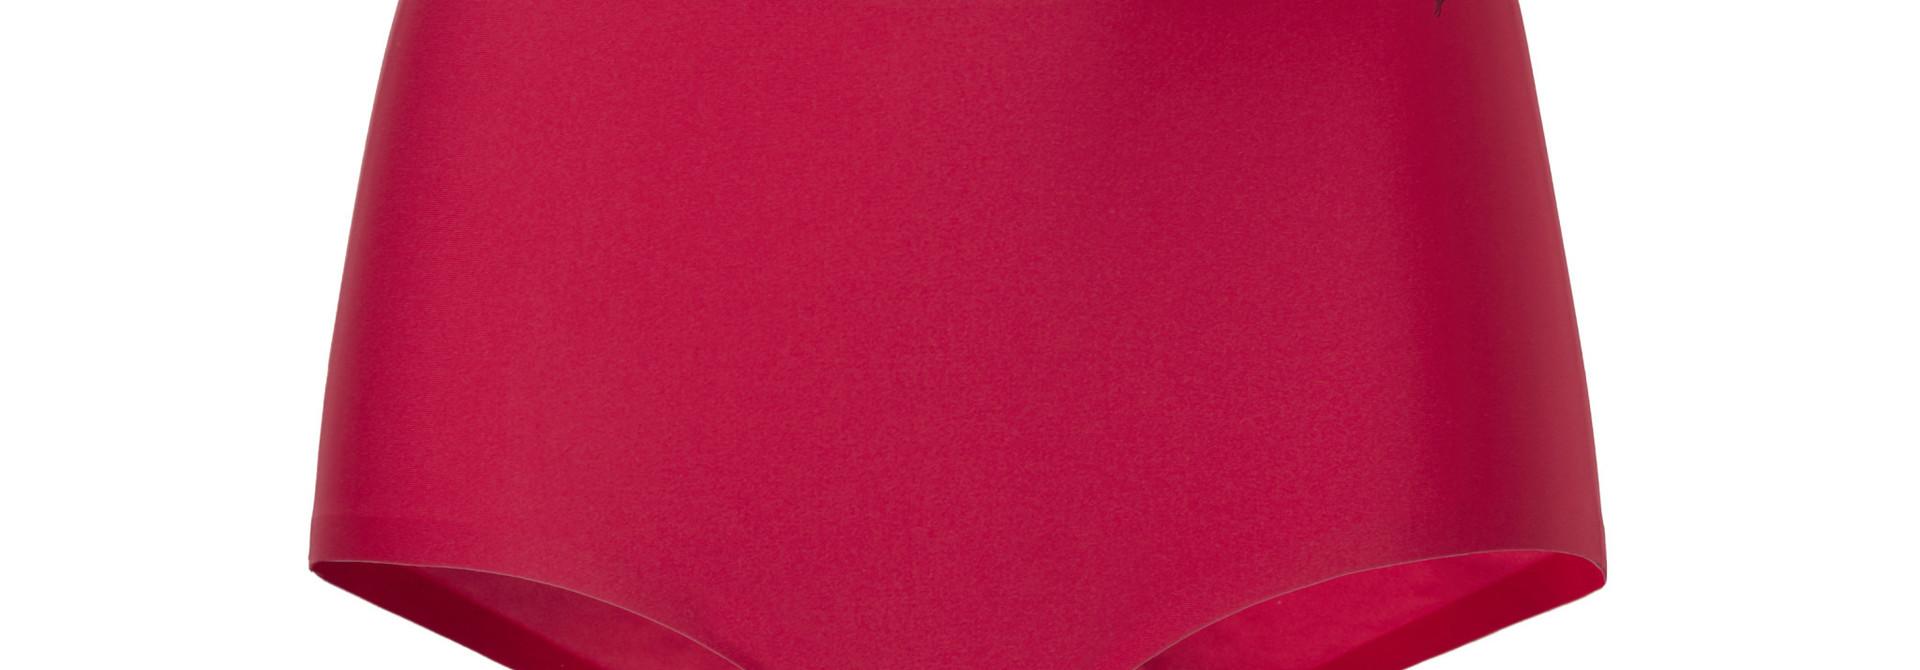 Maxi Secrets 30176 - rood